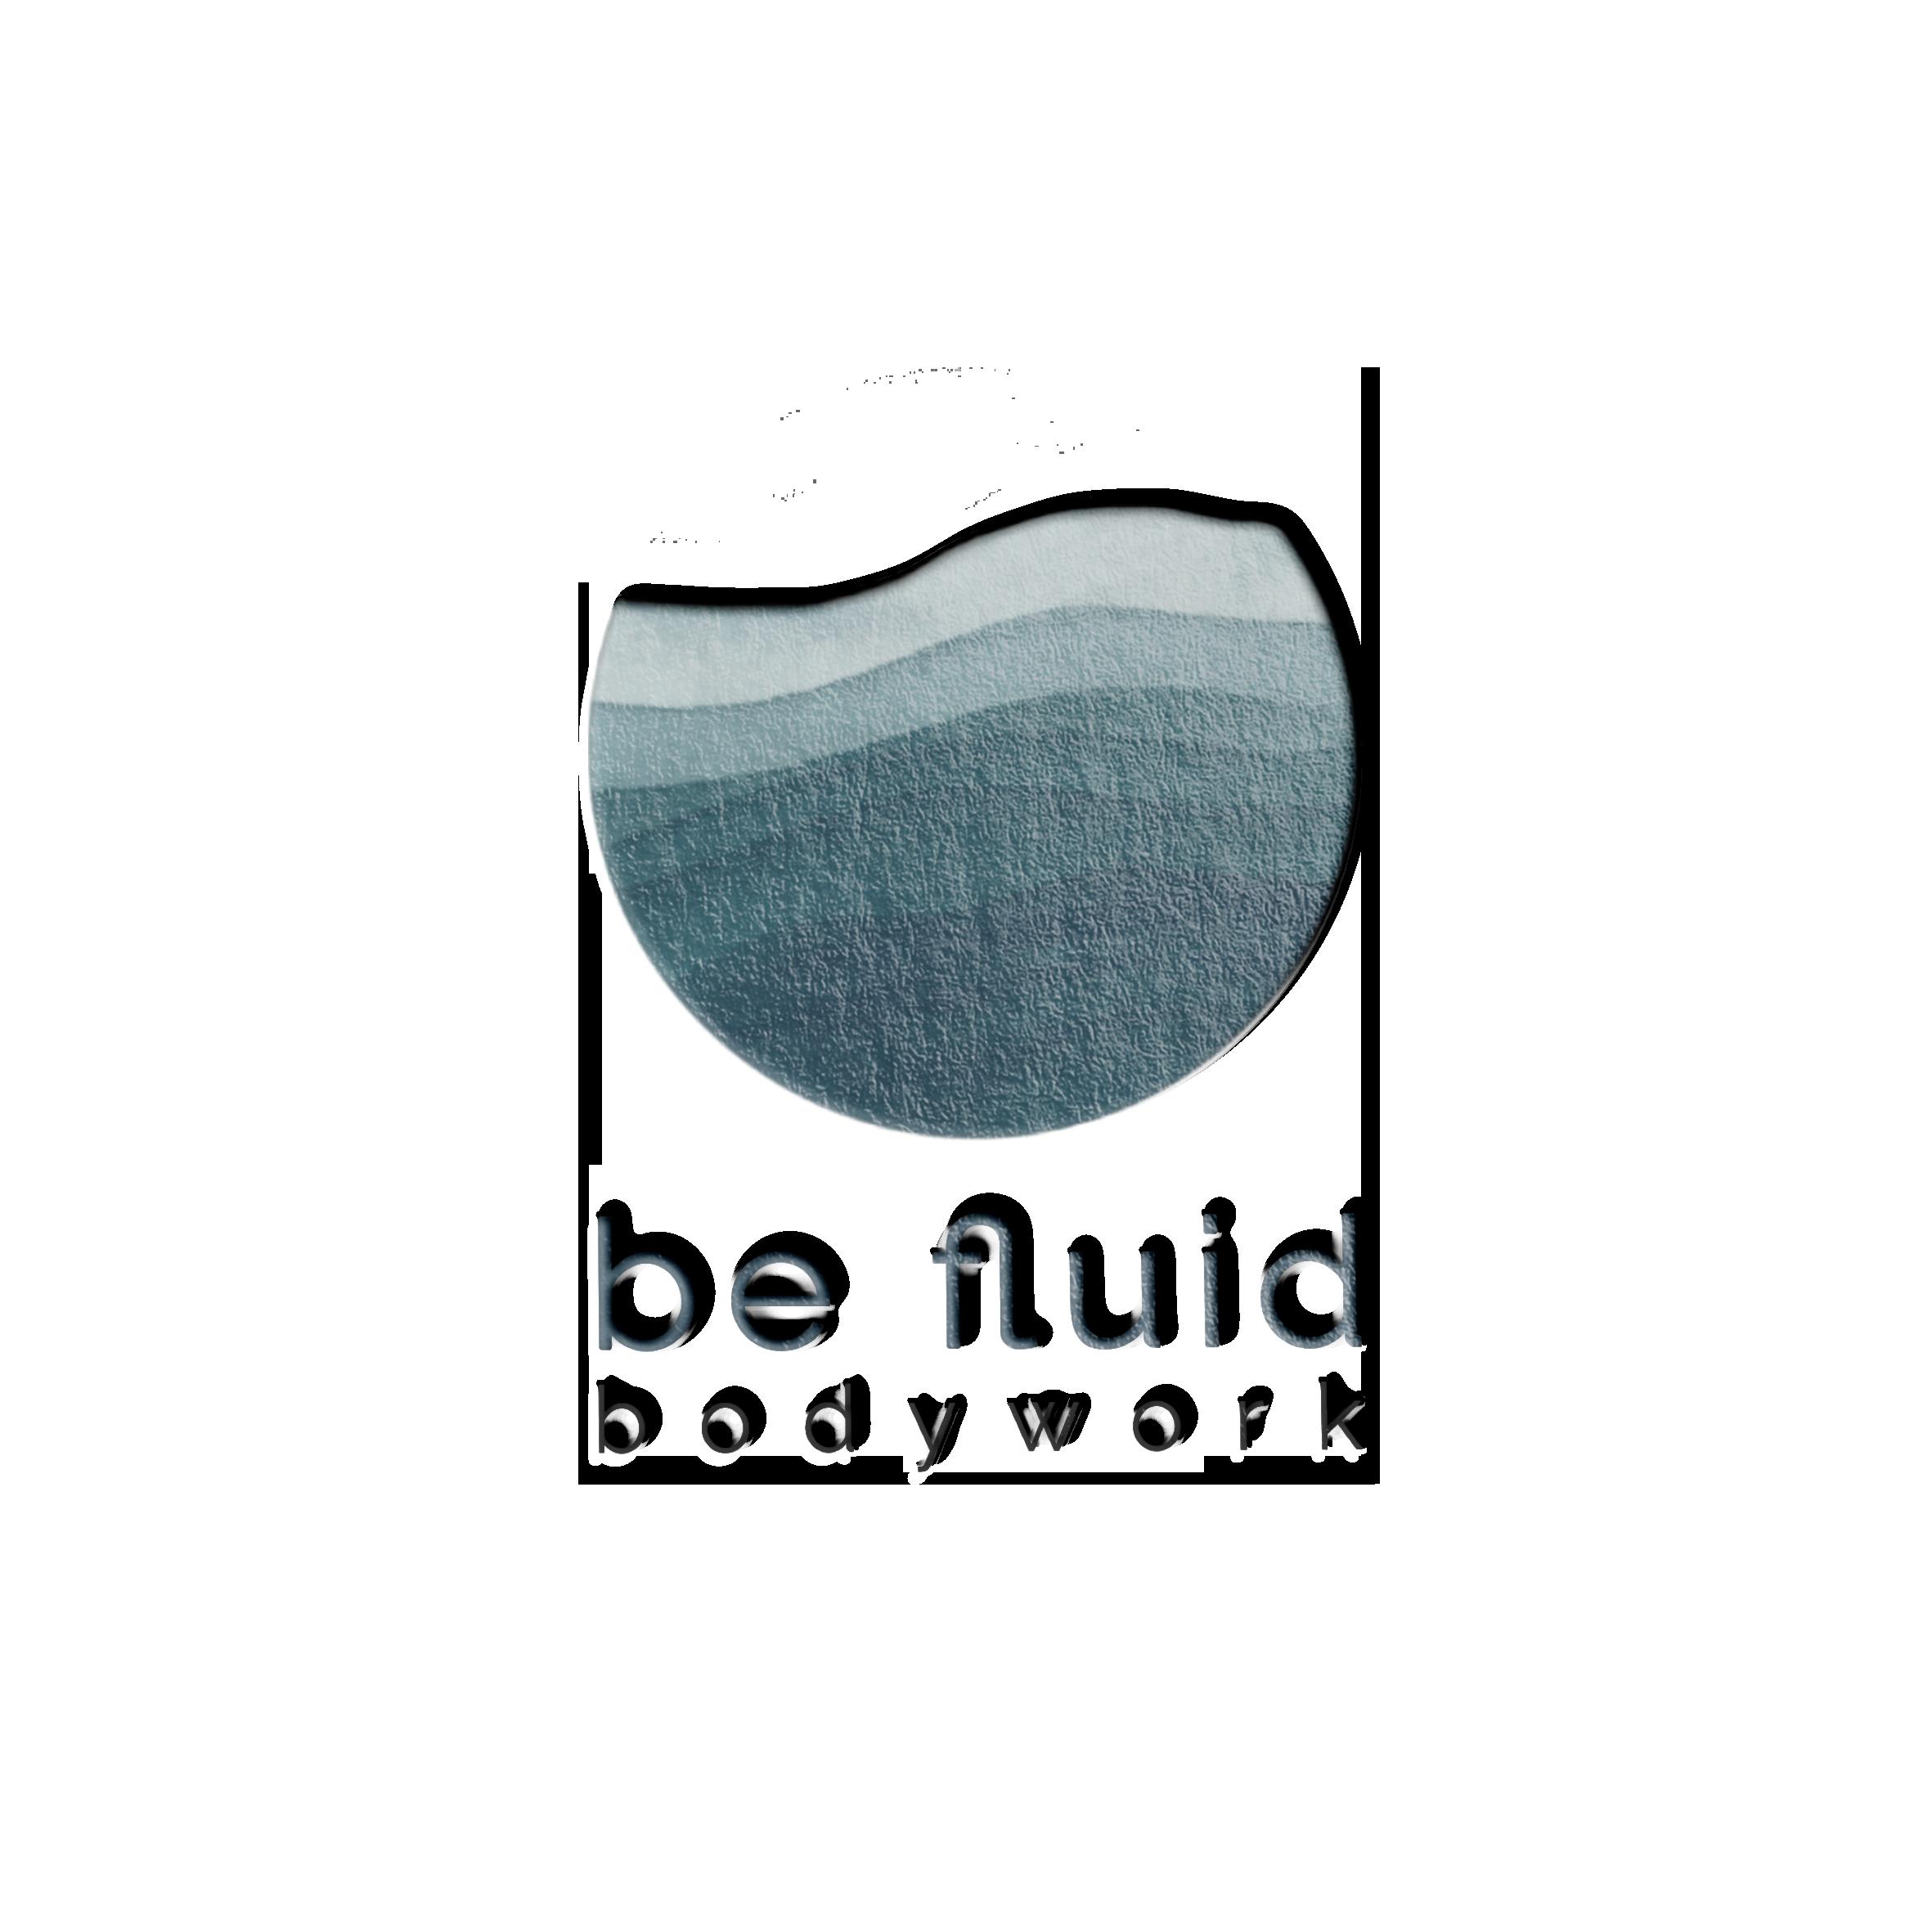 Innovative massage and bodywork office needs eye-catching new logo